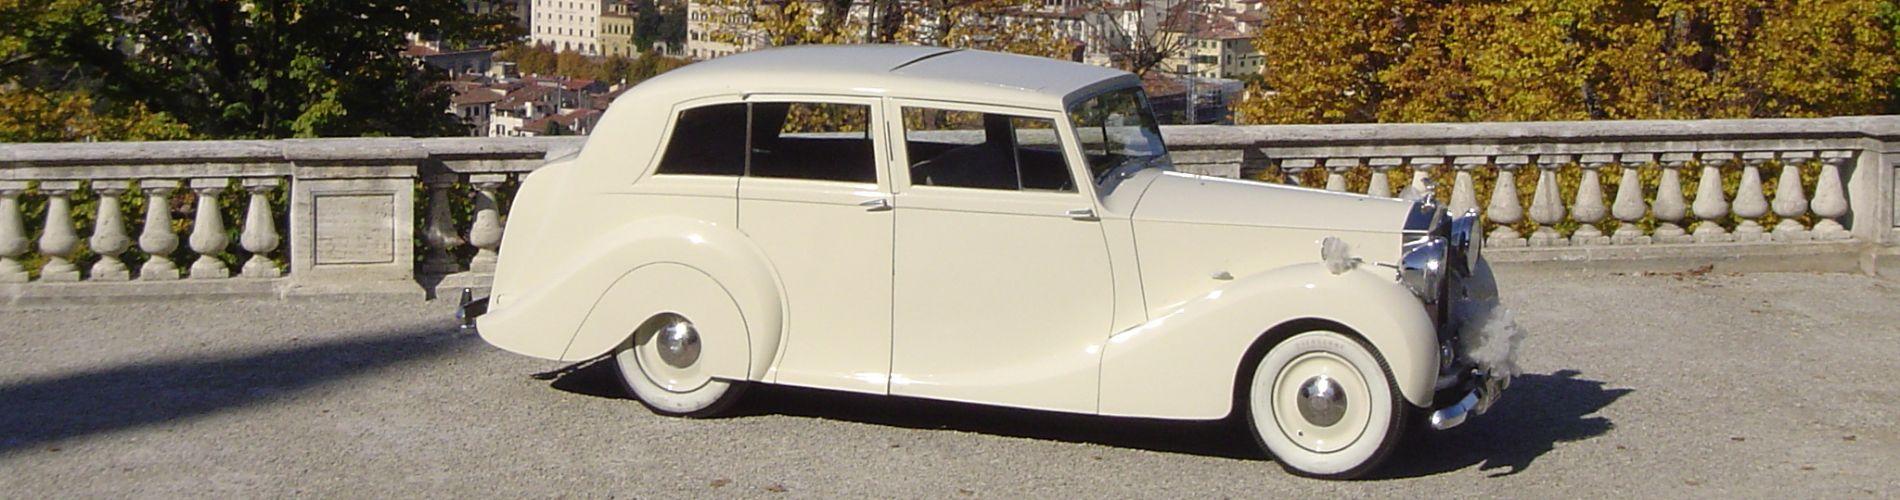 Classic Car Hire - HCHG